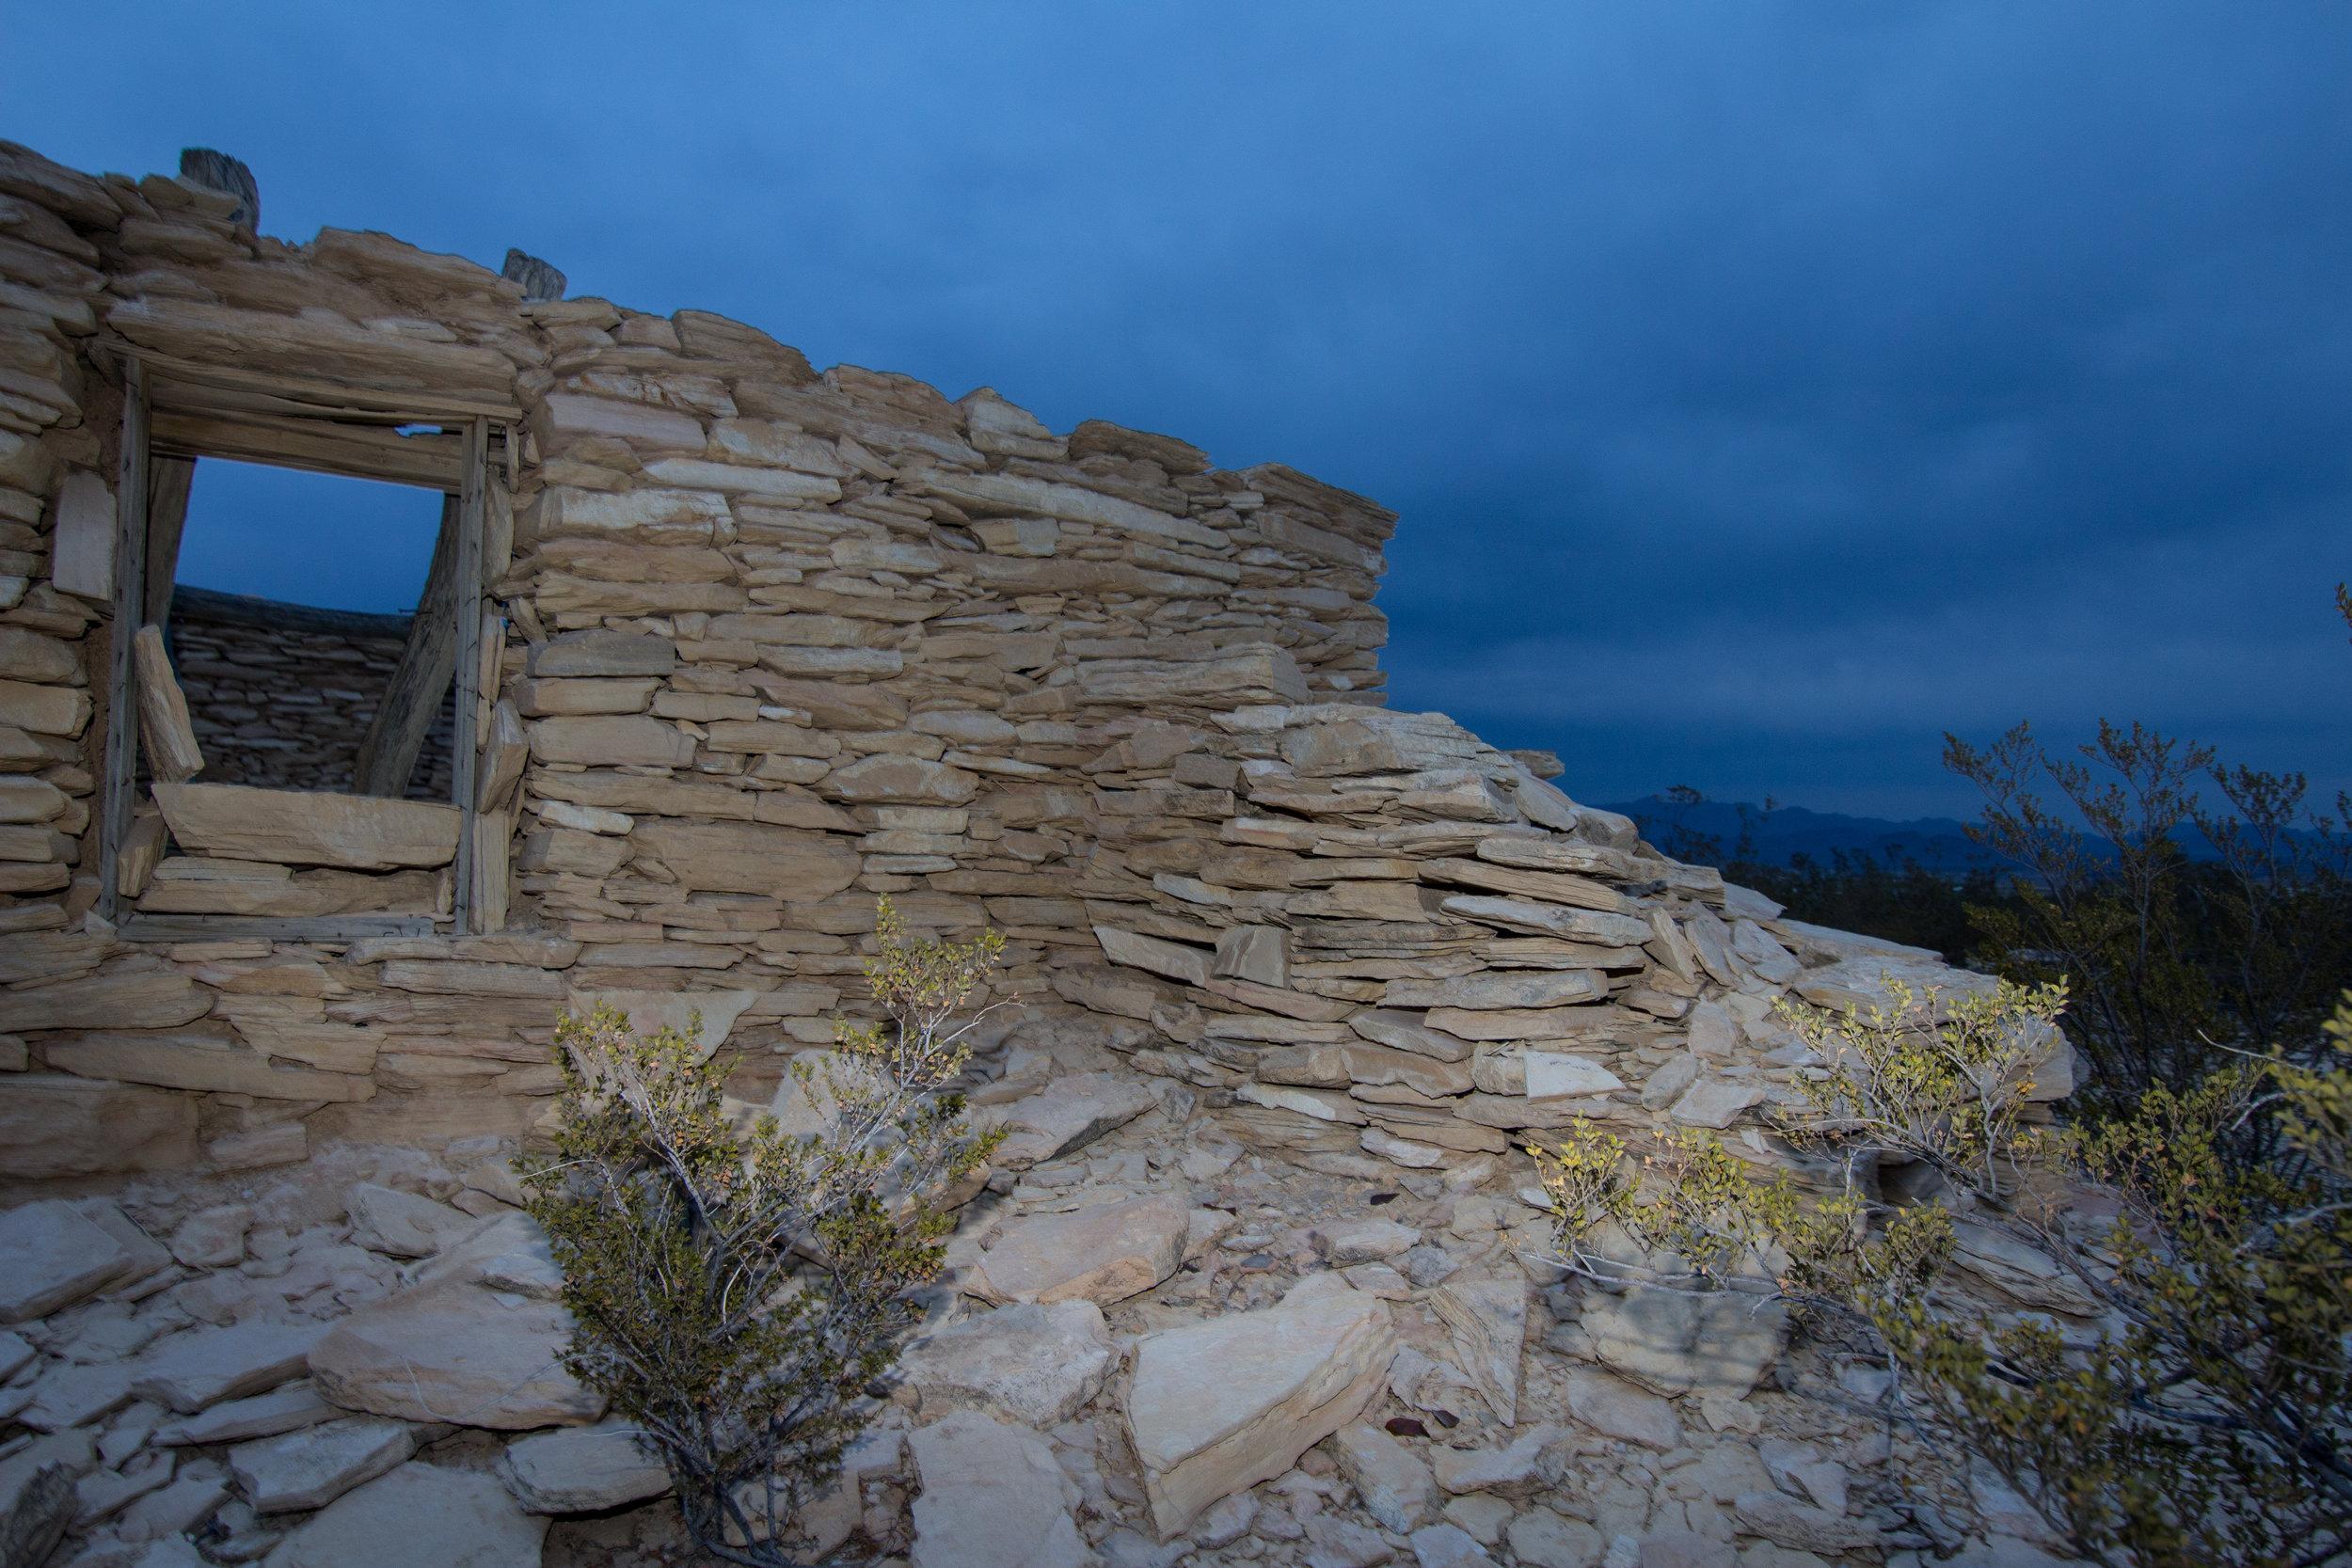 The road home runs past older real estate. Terlingua, TX